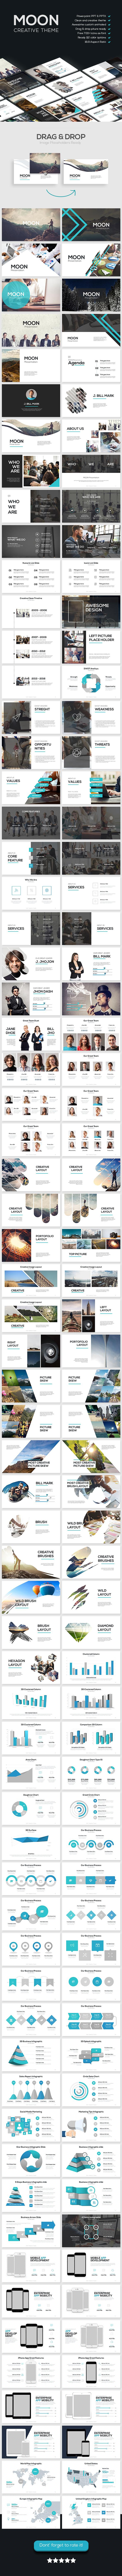 MOON - Creative Theme (PowerPoint Templates)